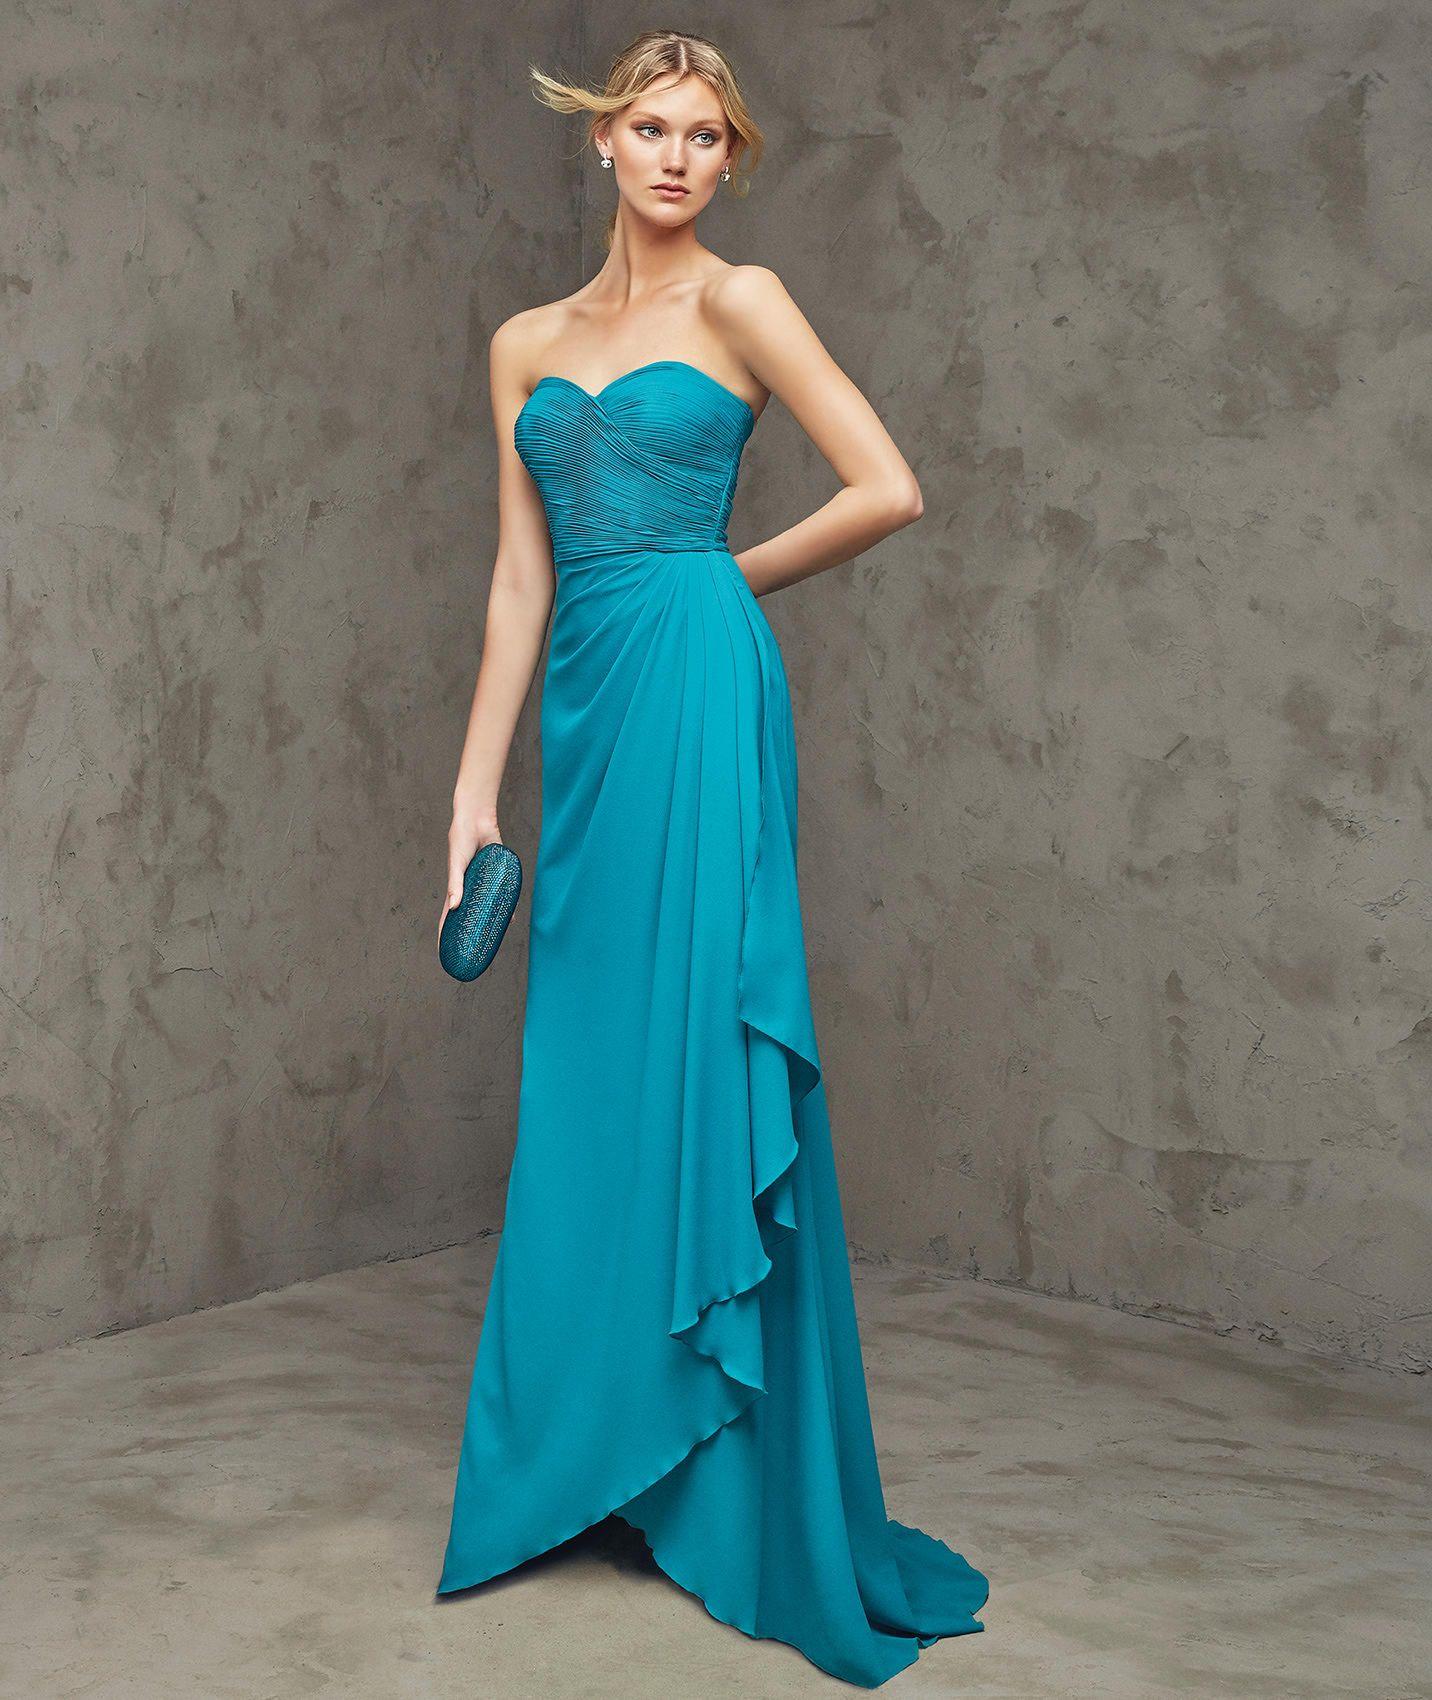 a8e314f2c8 FREYA - Uzun mavi dantel parti elbisesi